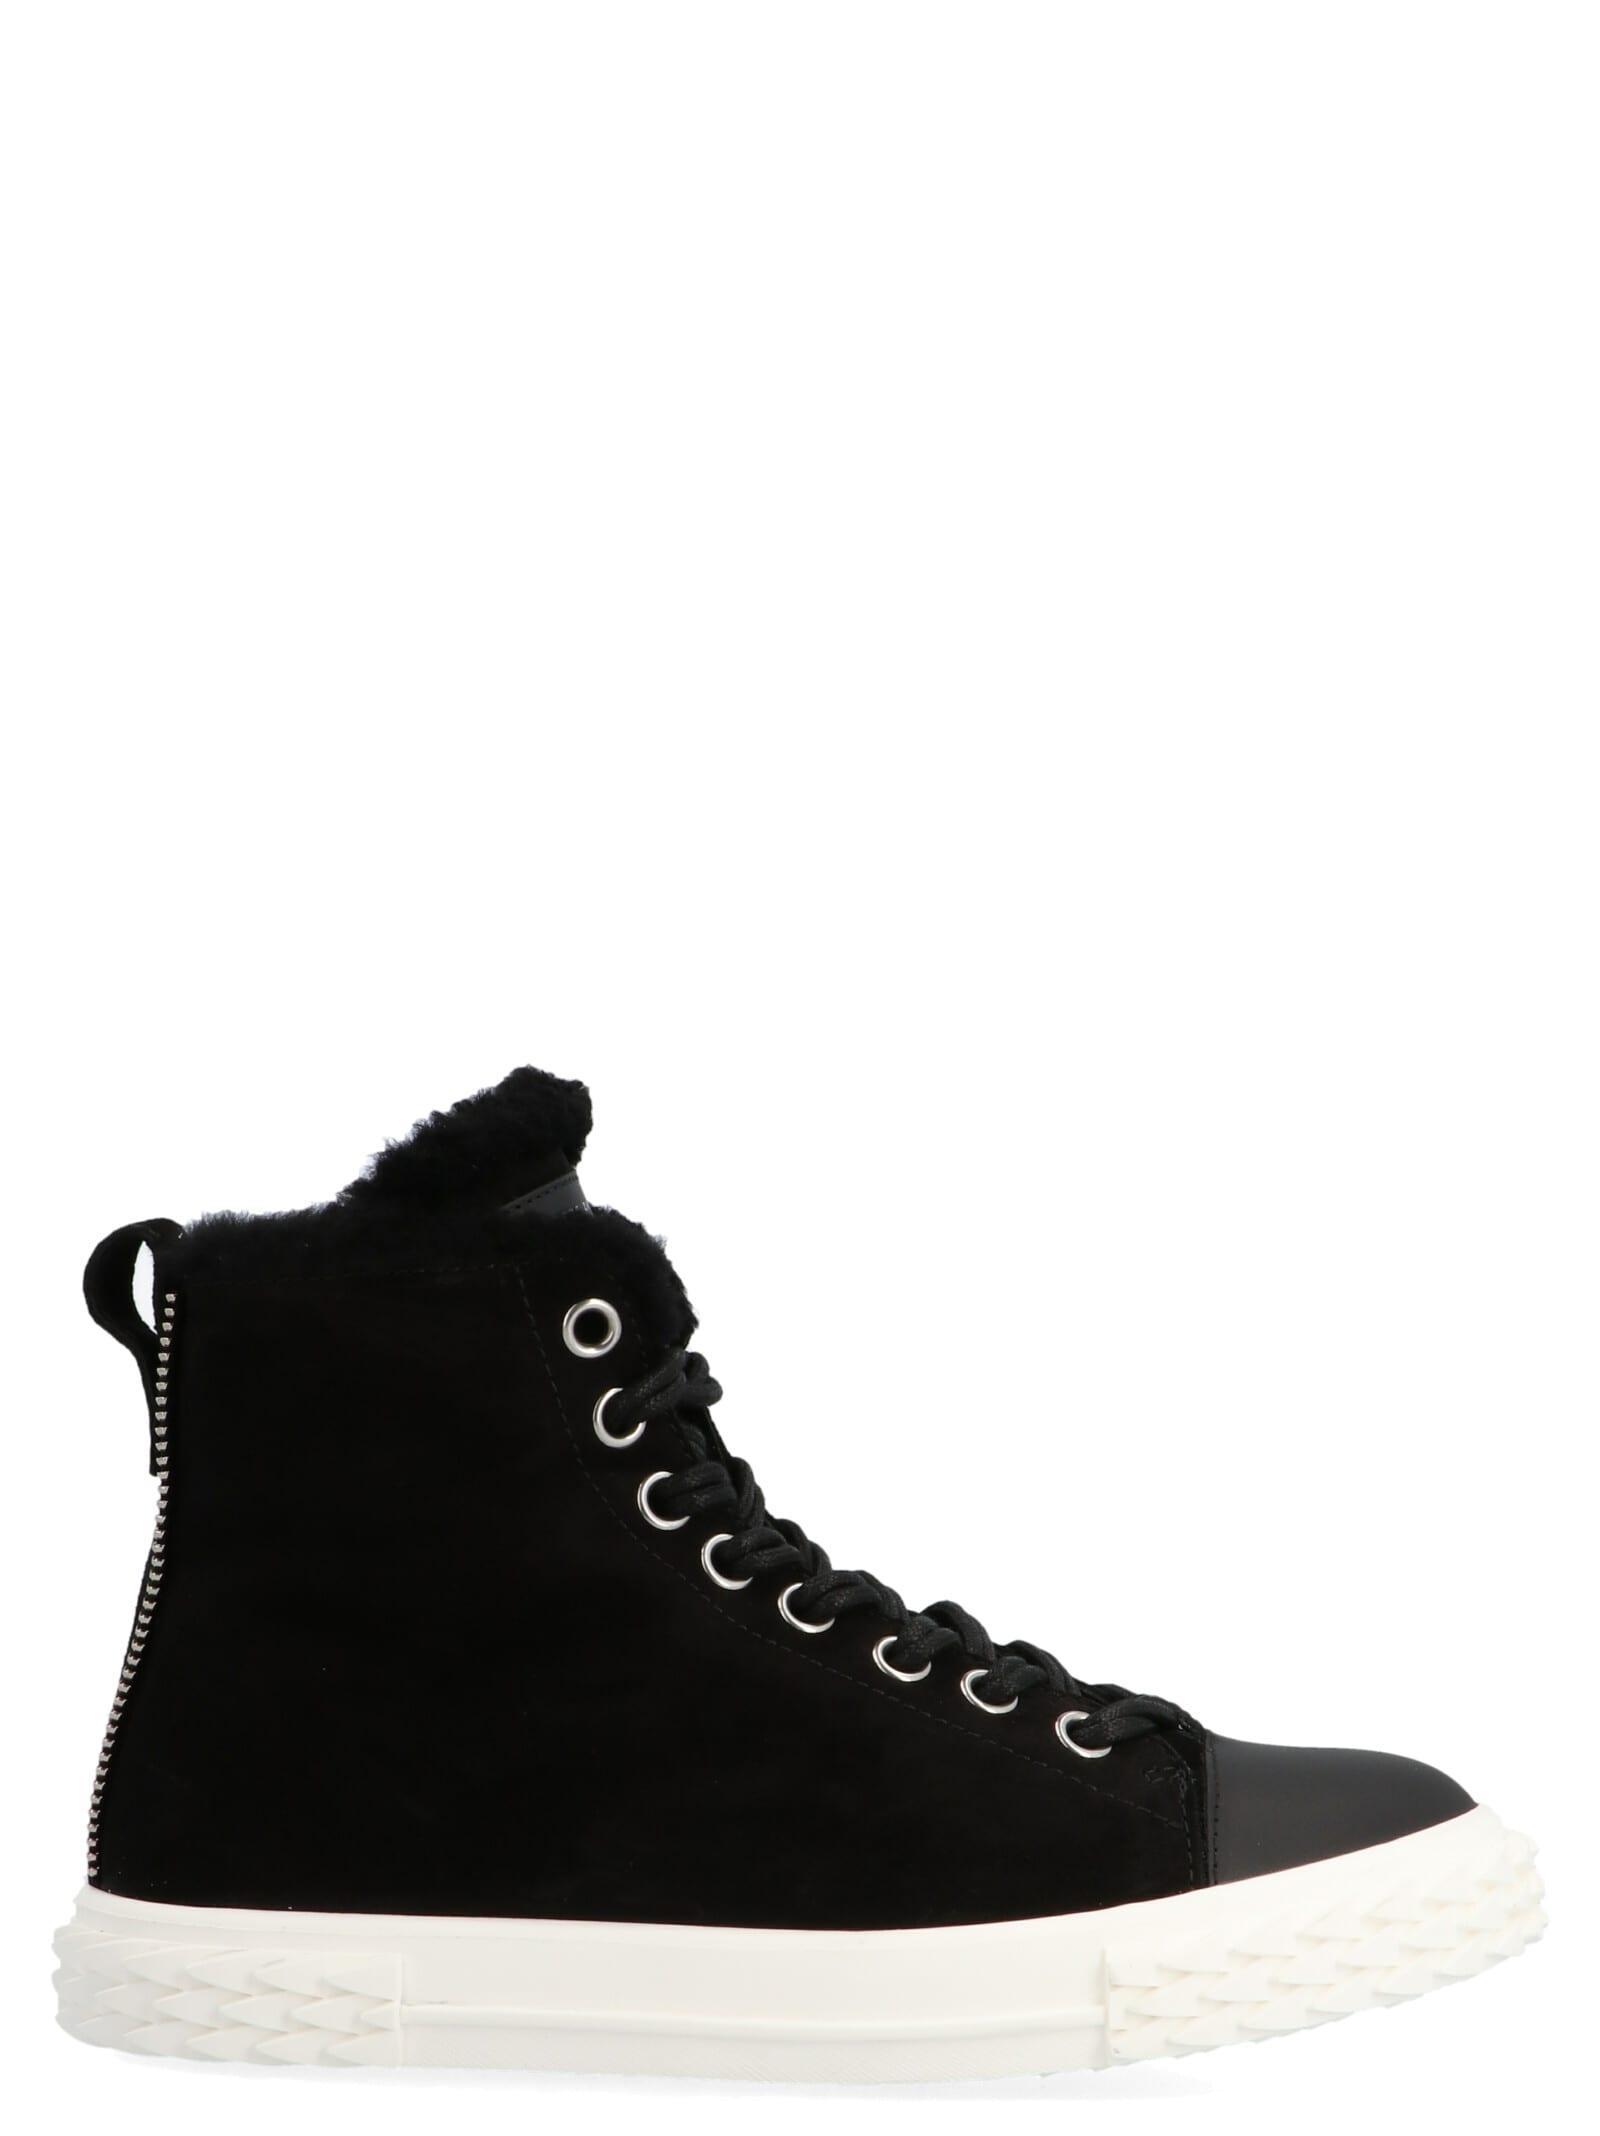 Giuseppe Zanotti blabber Shoes